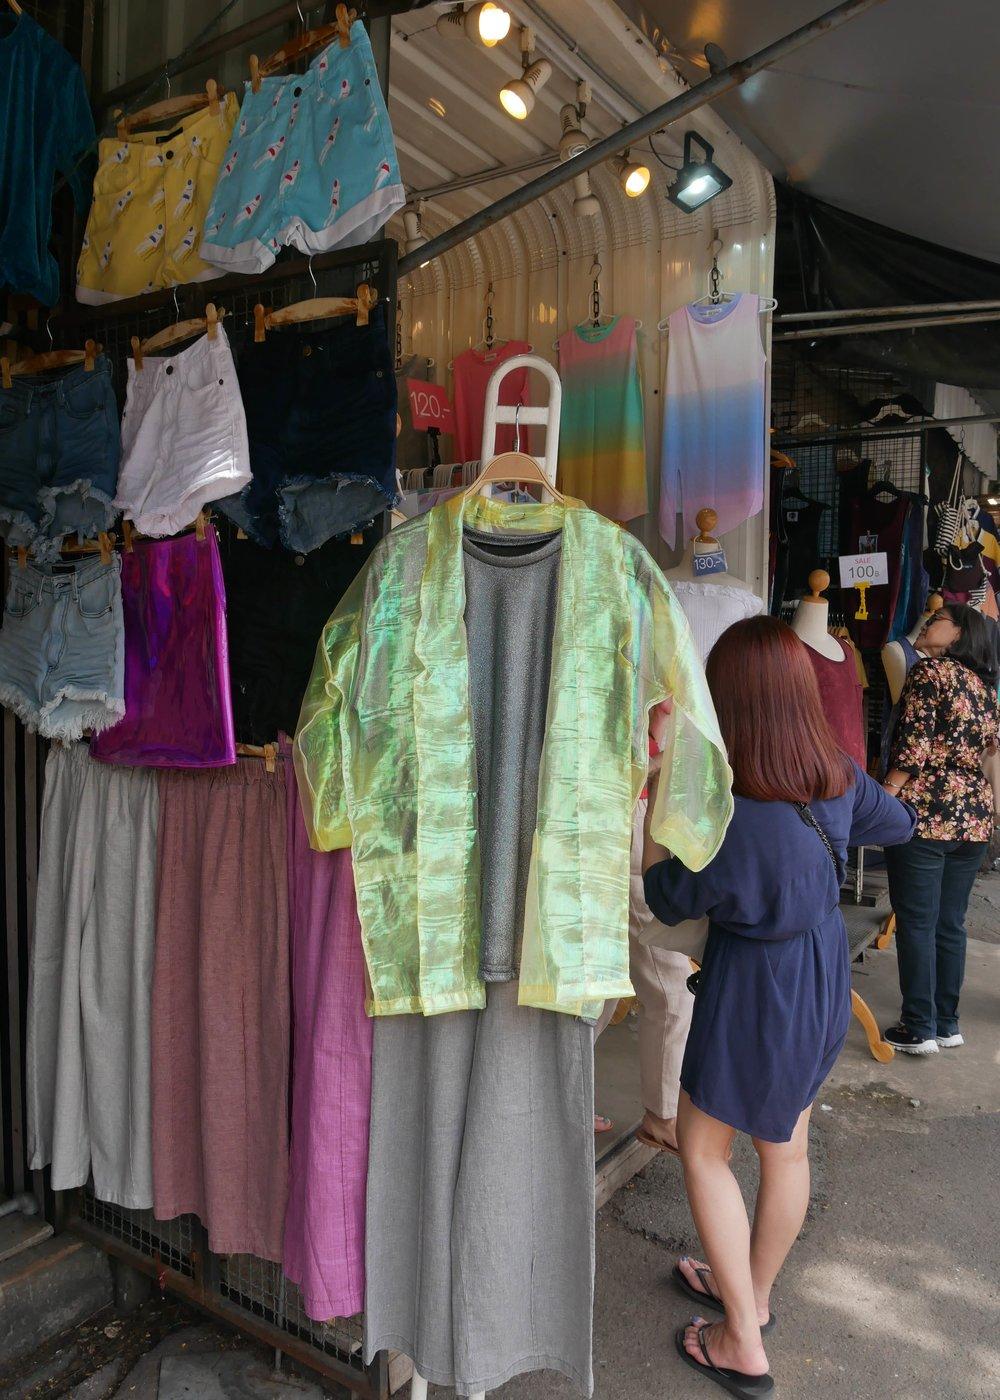 Bargains at Chatuchak Market